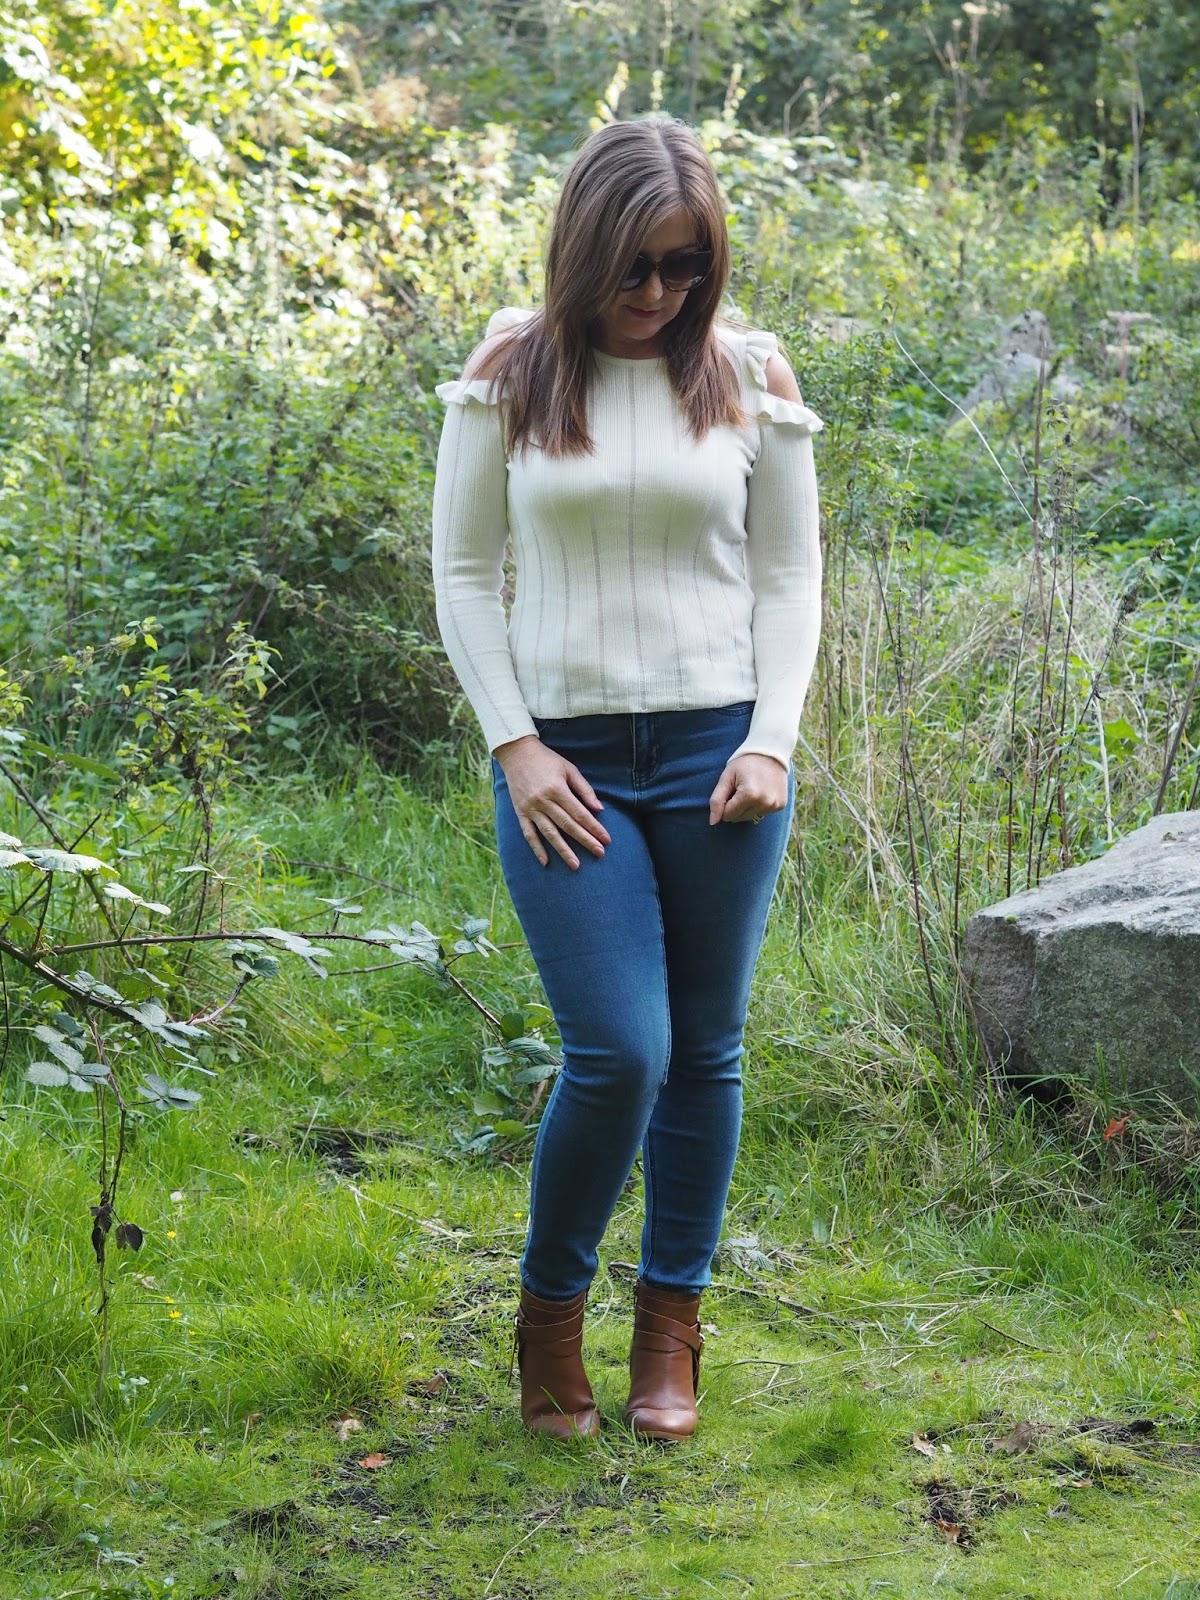 Autumn fashion Burberry scarf knitwear Priceless Life of Mine